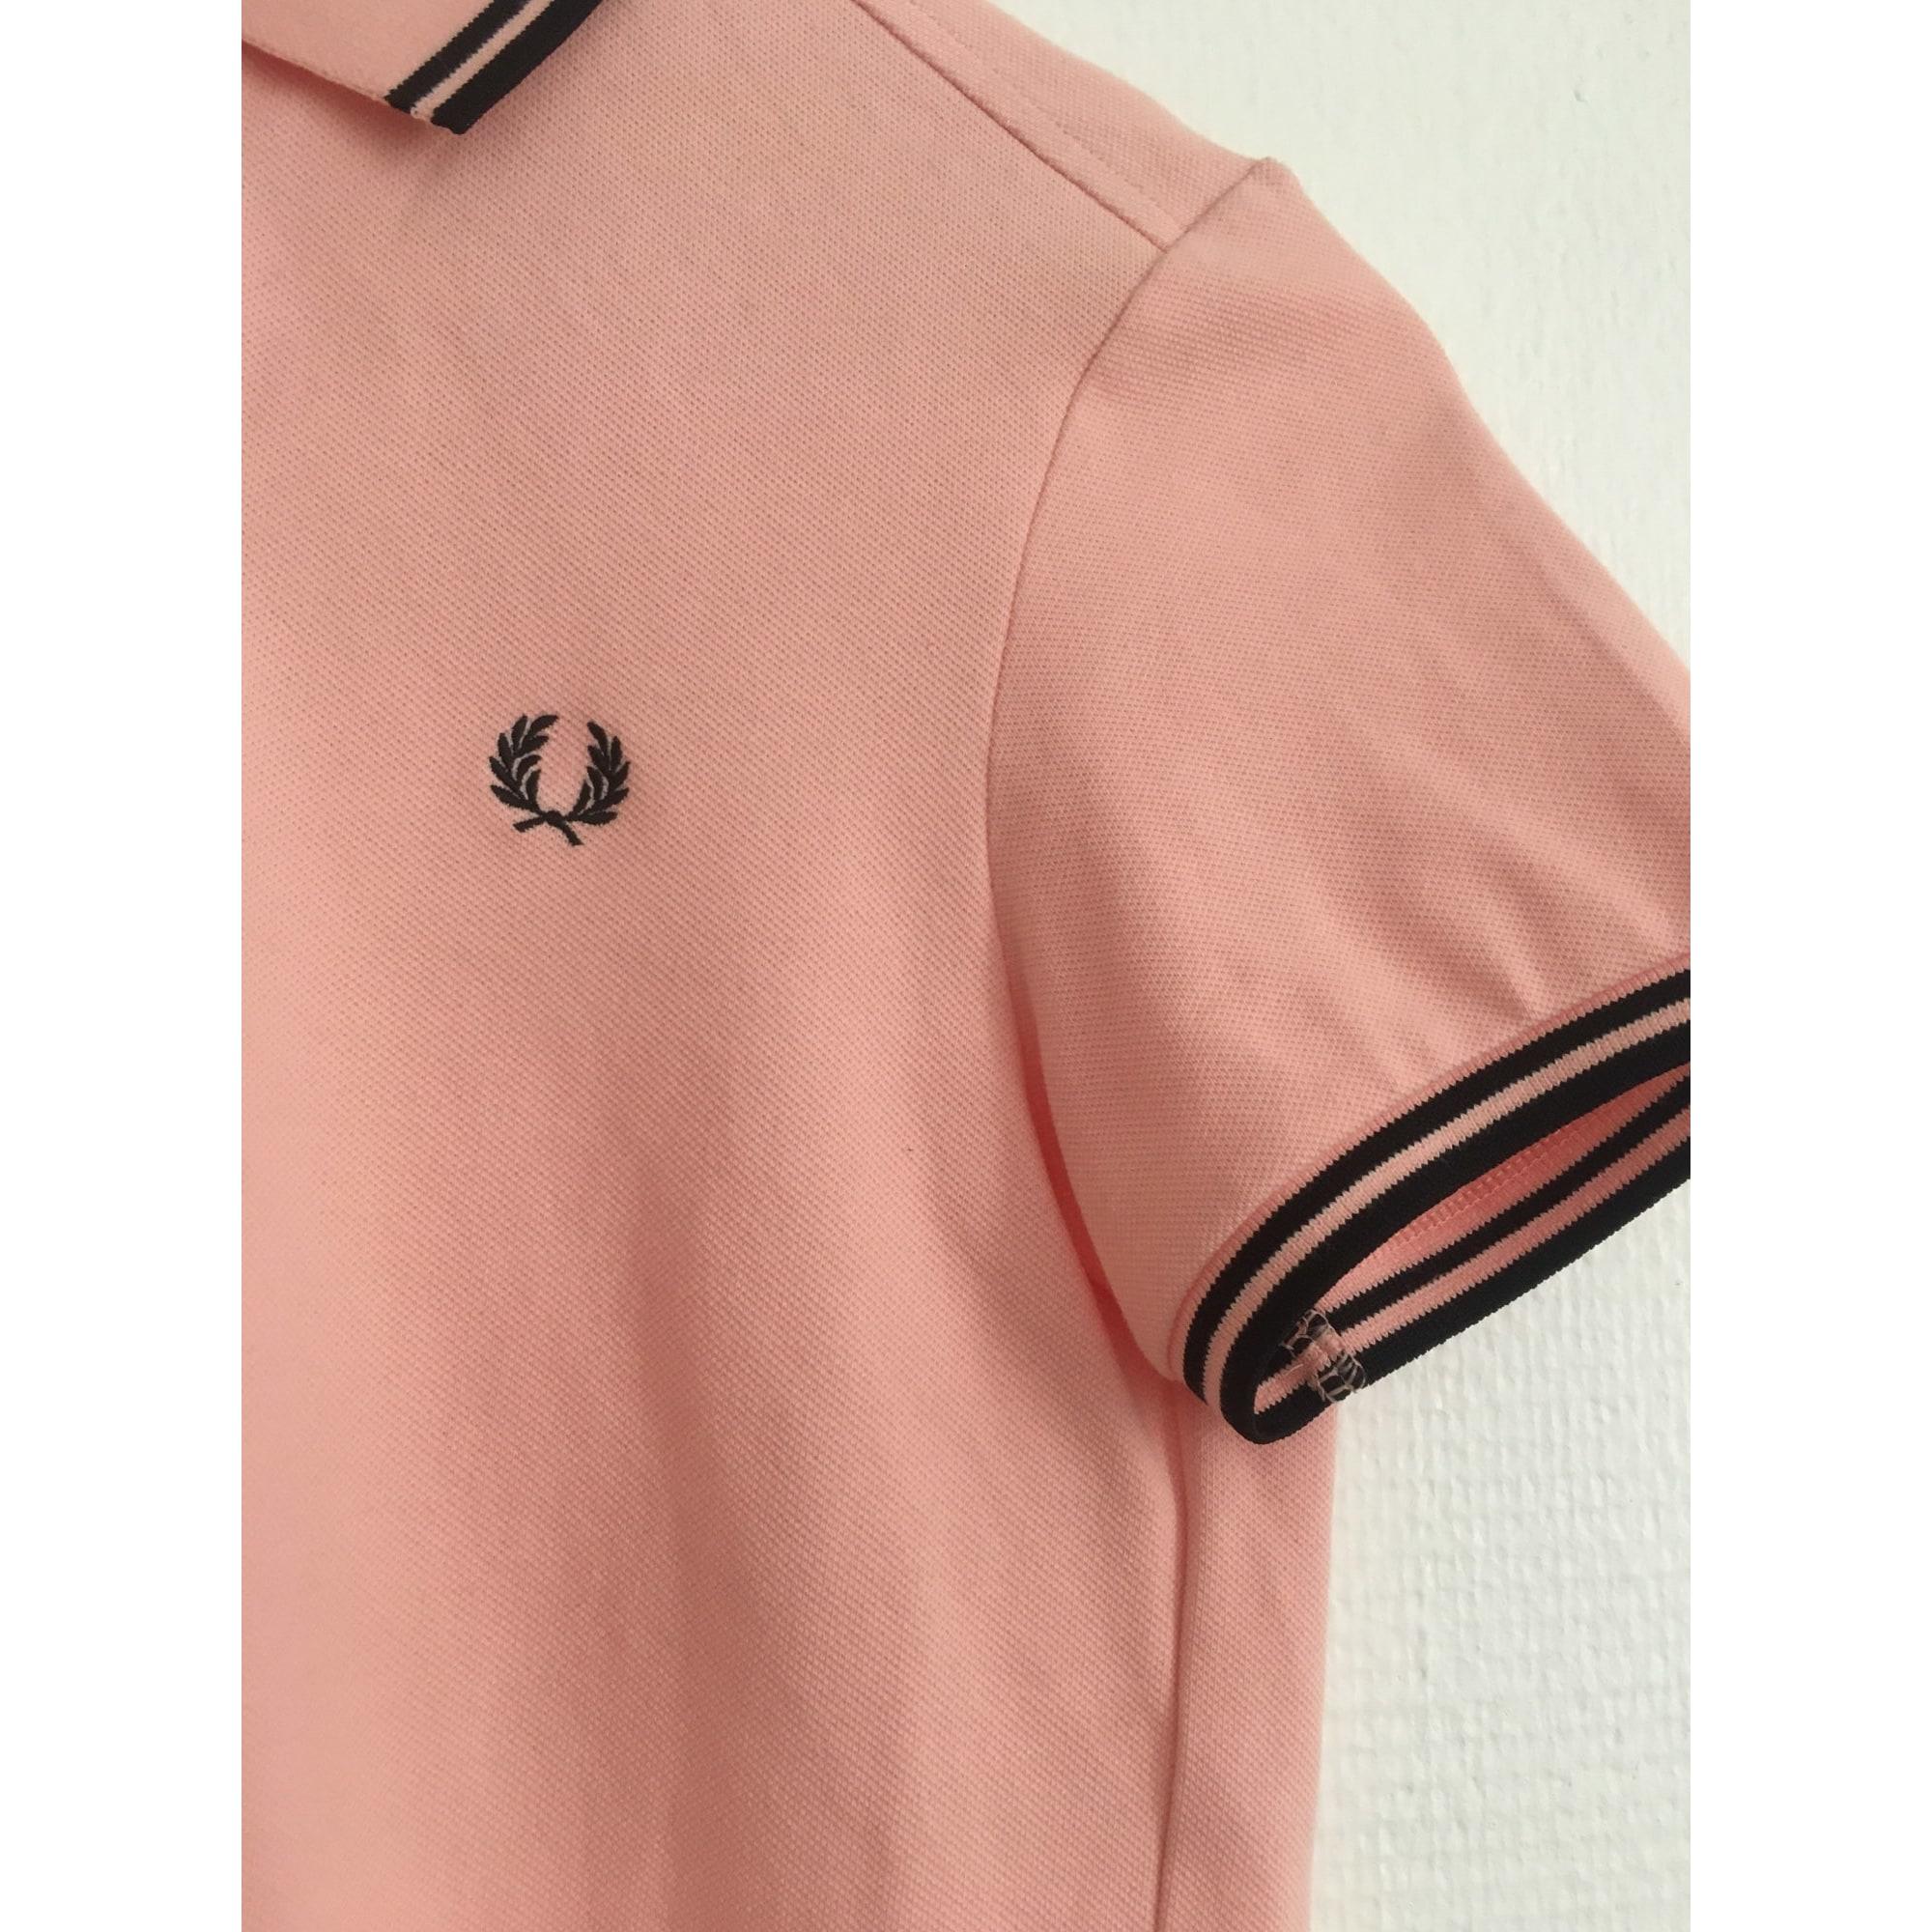 Top, tee-shirt FRED PERRY Rose, fuschia, vieux rose